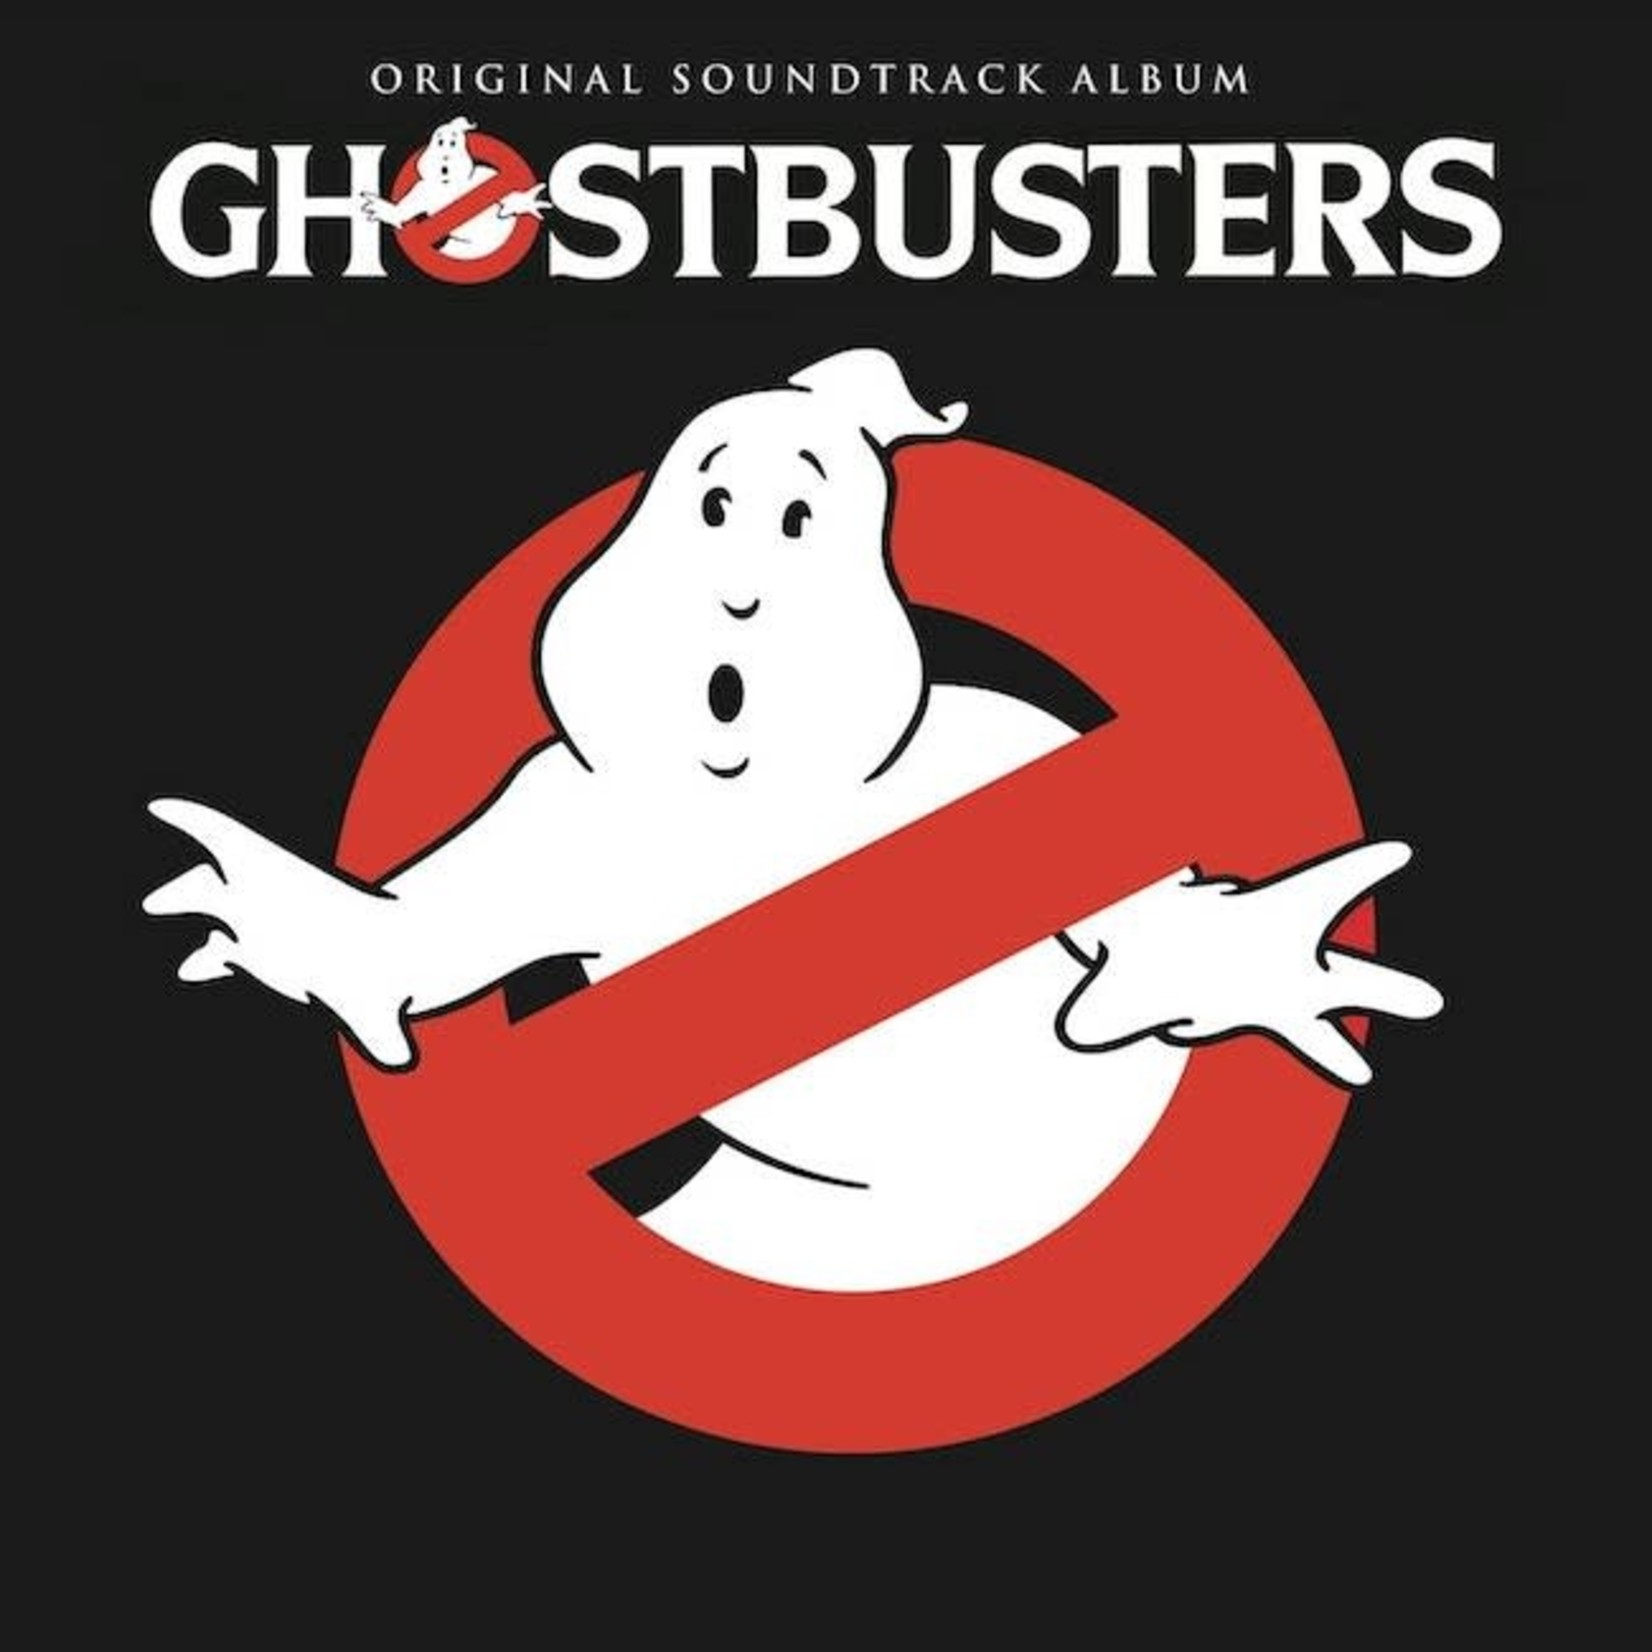 [Vintage] Various: Ghostbusters (Soundtrack)